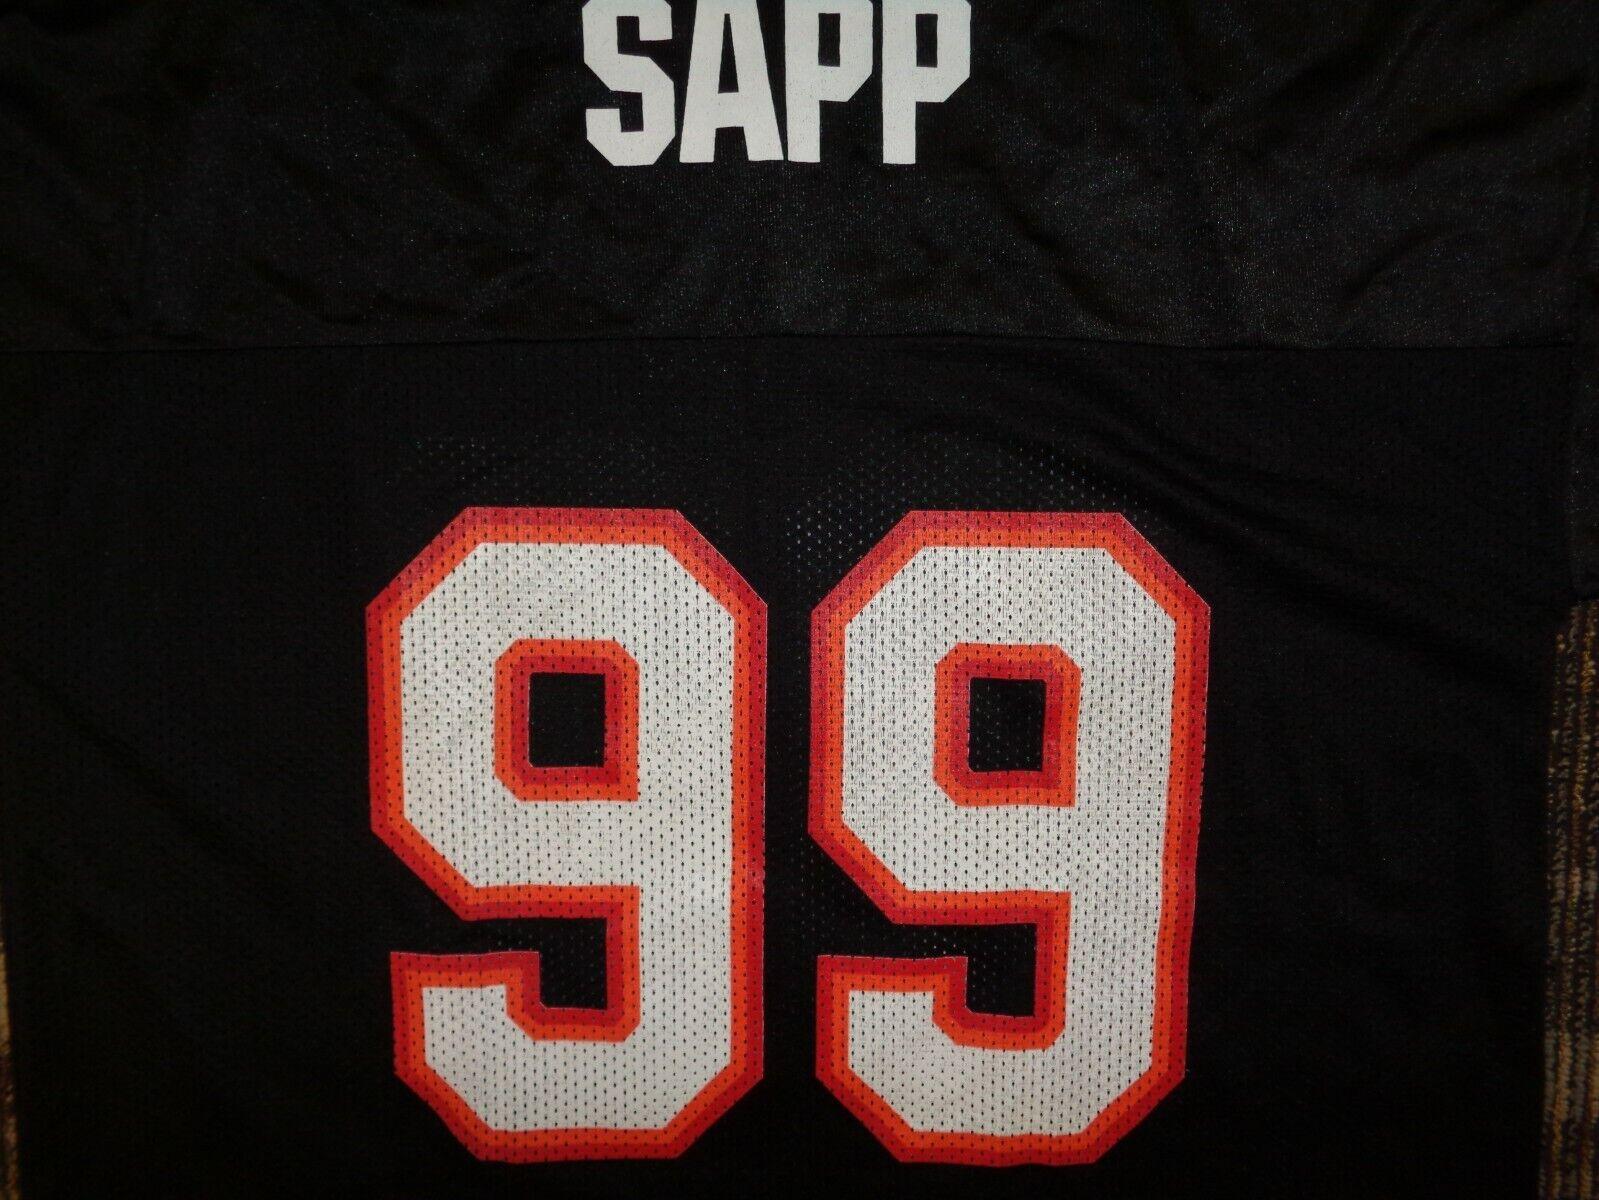 LOT-WARREN SAPP GARNER TAMPA BAY BUCCANEERS REEBOK MENS BLACK NFL GAME JERSEYS  - $49.99